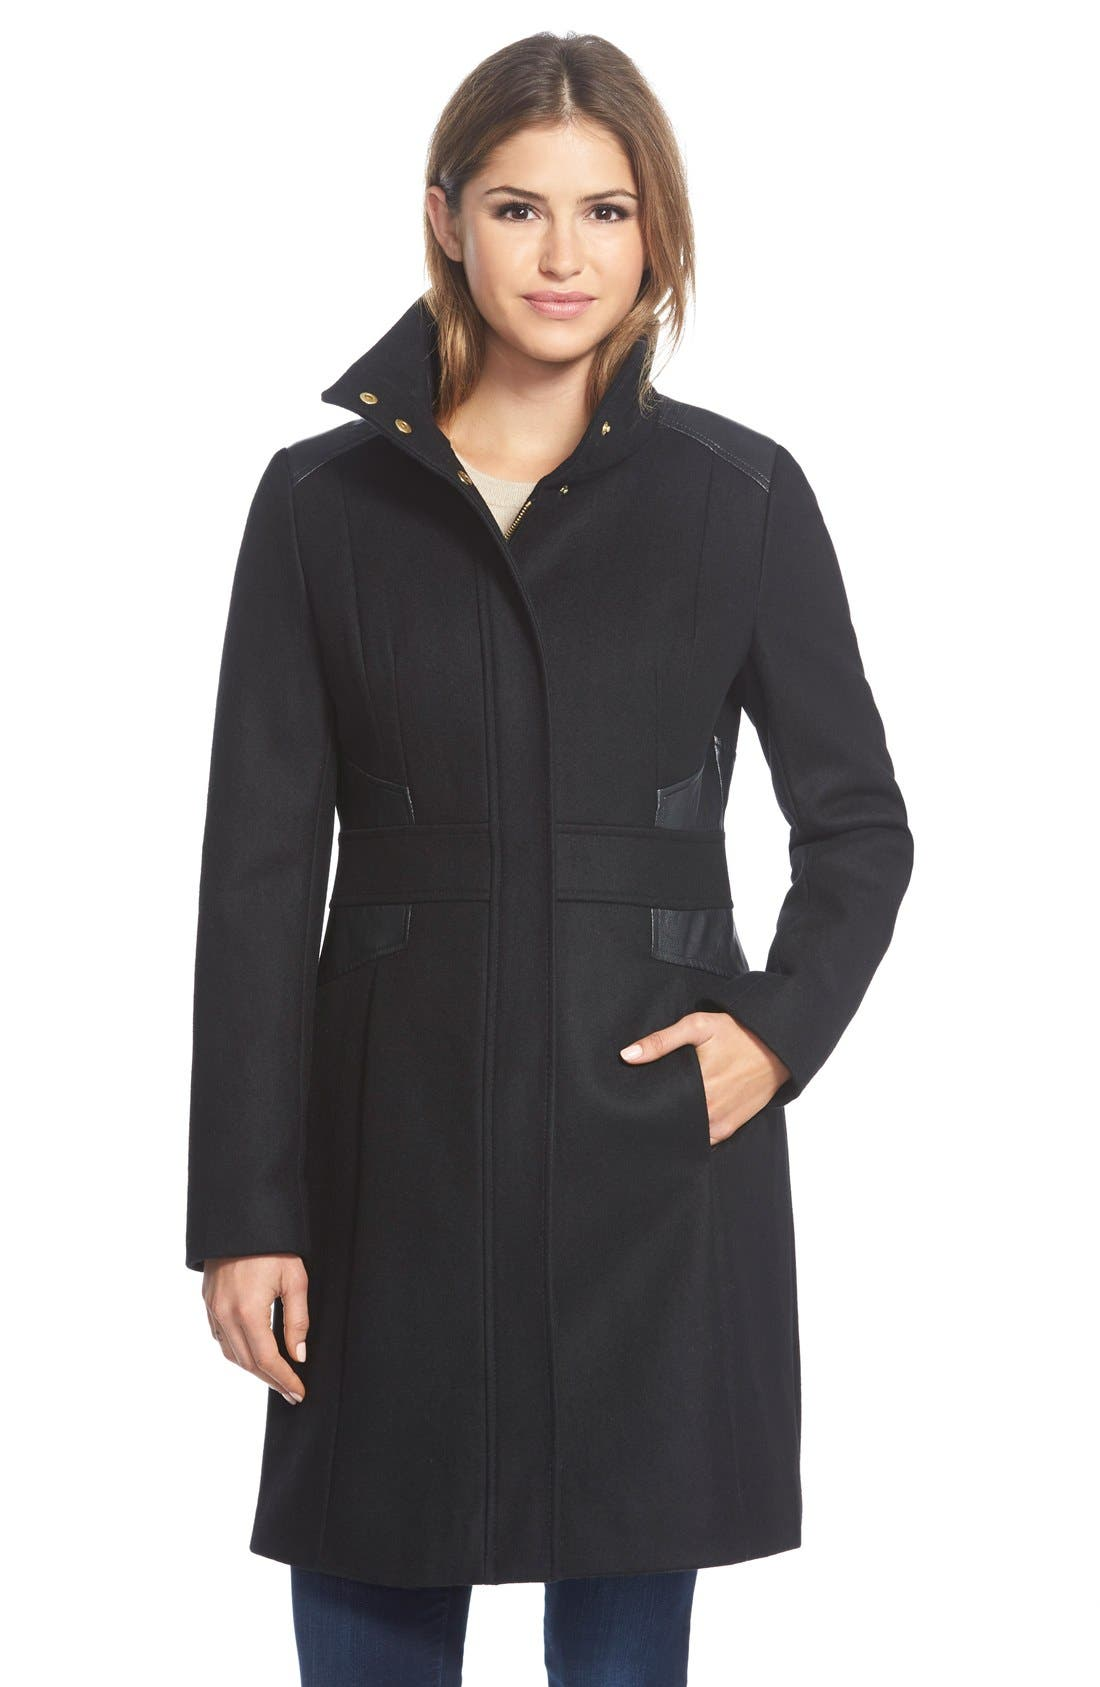 Alternate Image 1 Selected - Via Spiga Wool Blend Coat with Faux Leather Trim (Regular & Petite)